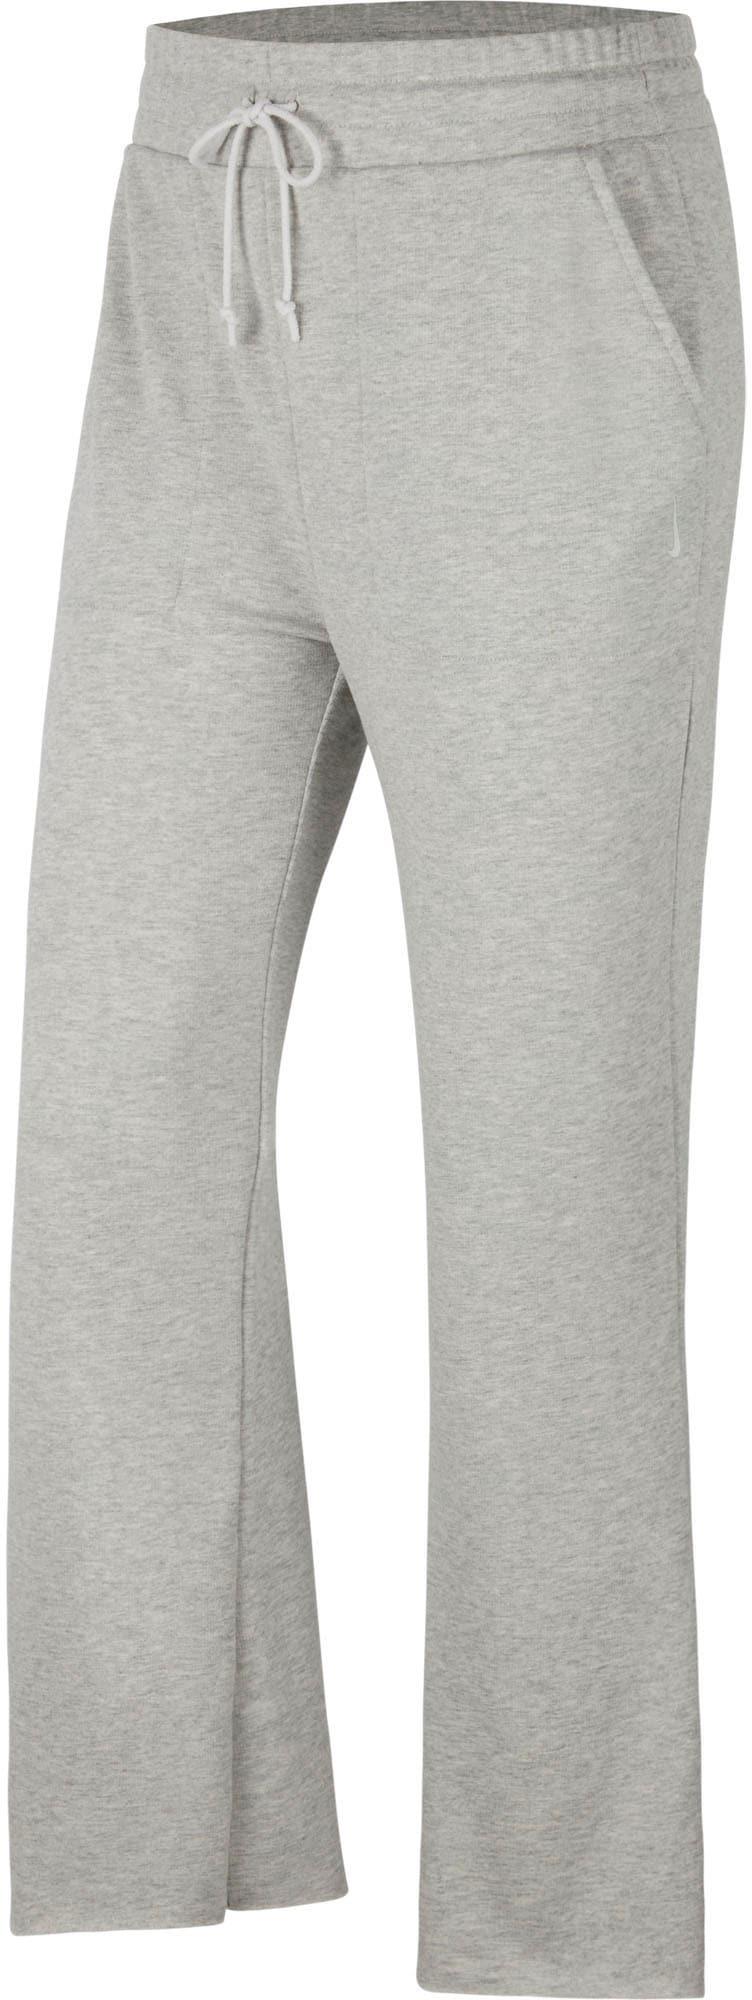 Nike Yogahose 7/8 Flare Pant grau Damen Hosen Knöchelhose